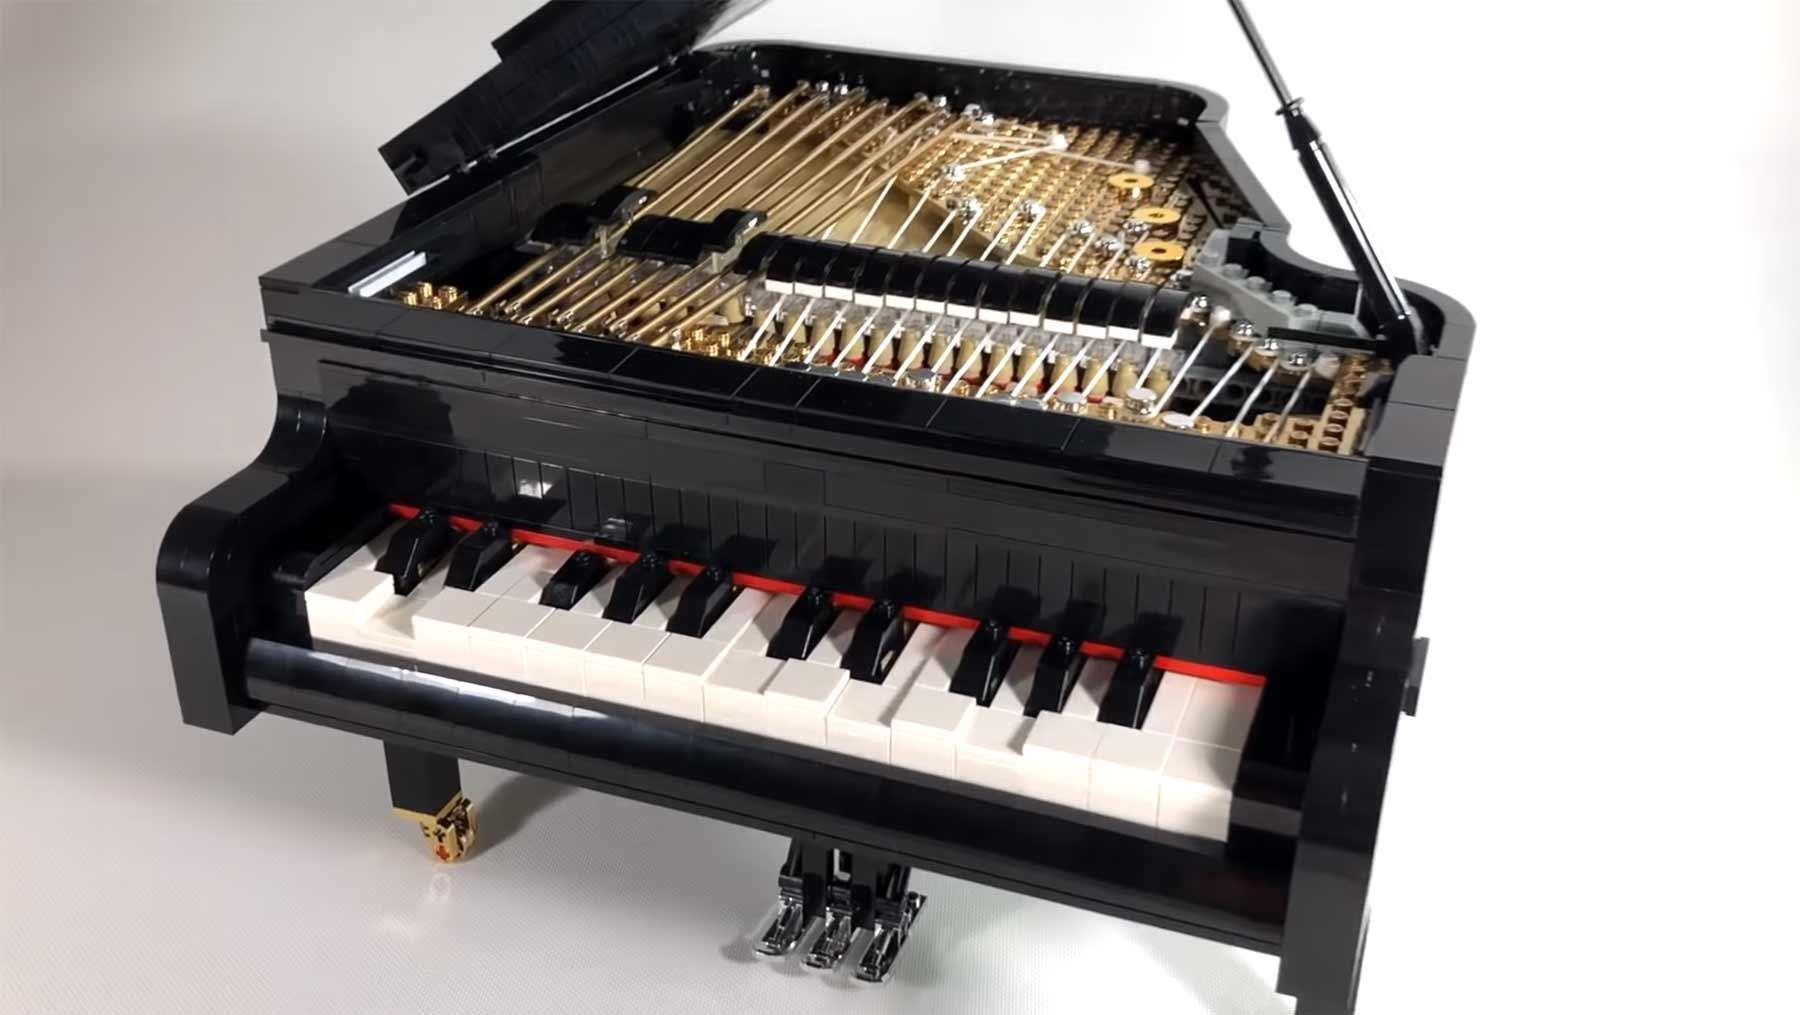 Ein Klavier aus LEGO, das man spielen kann Playable-Lego-Piano